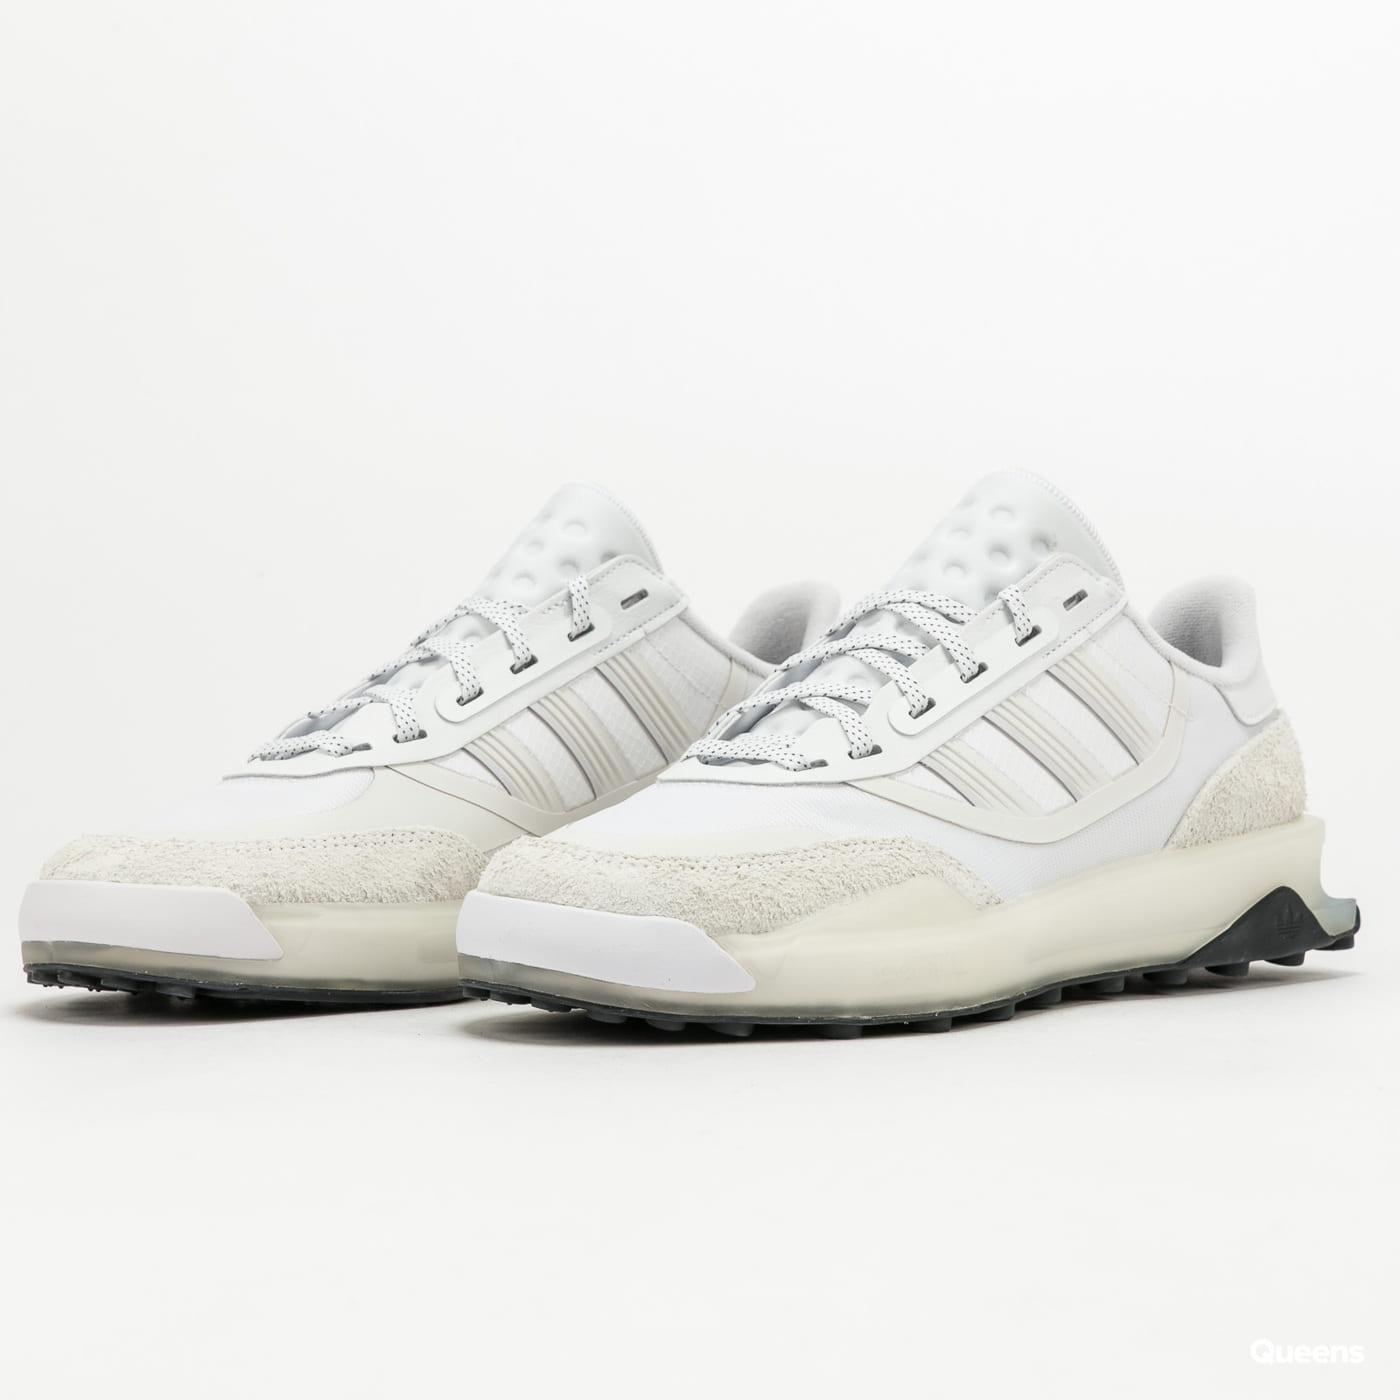 adidas Originals Indoor CT ftwwht / cblack / dshgry